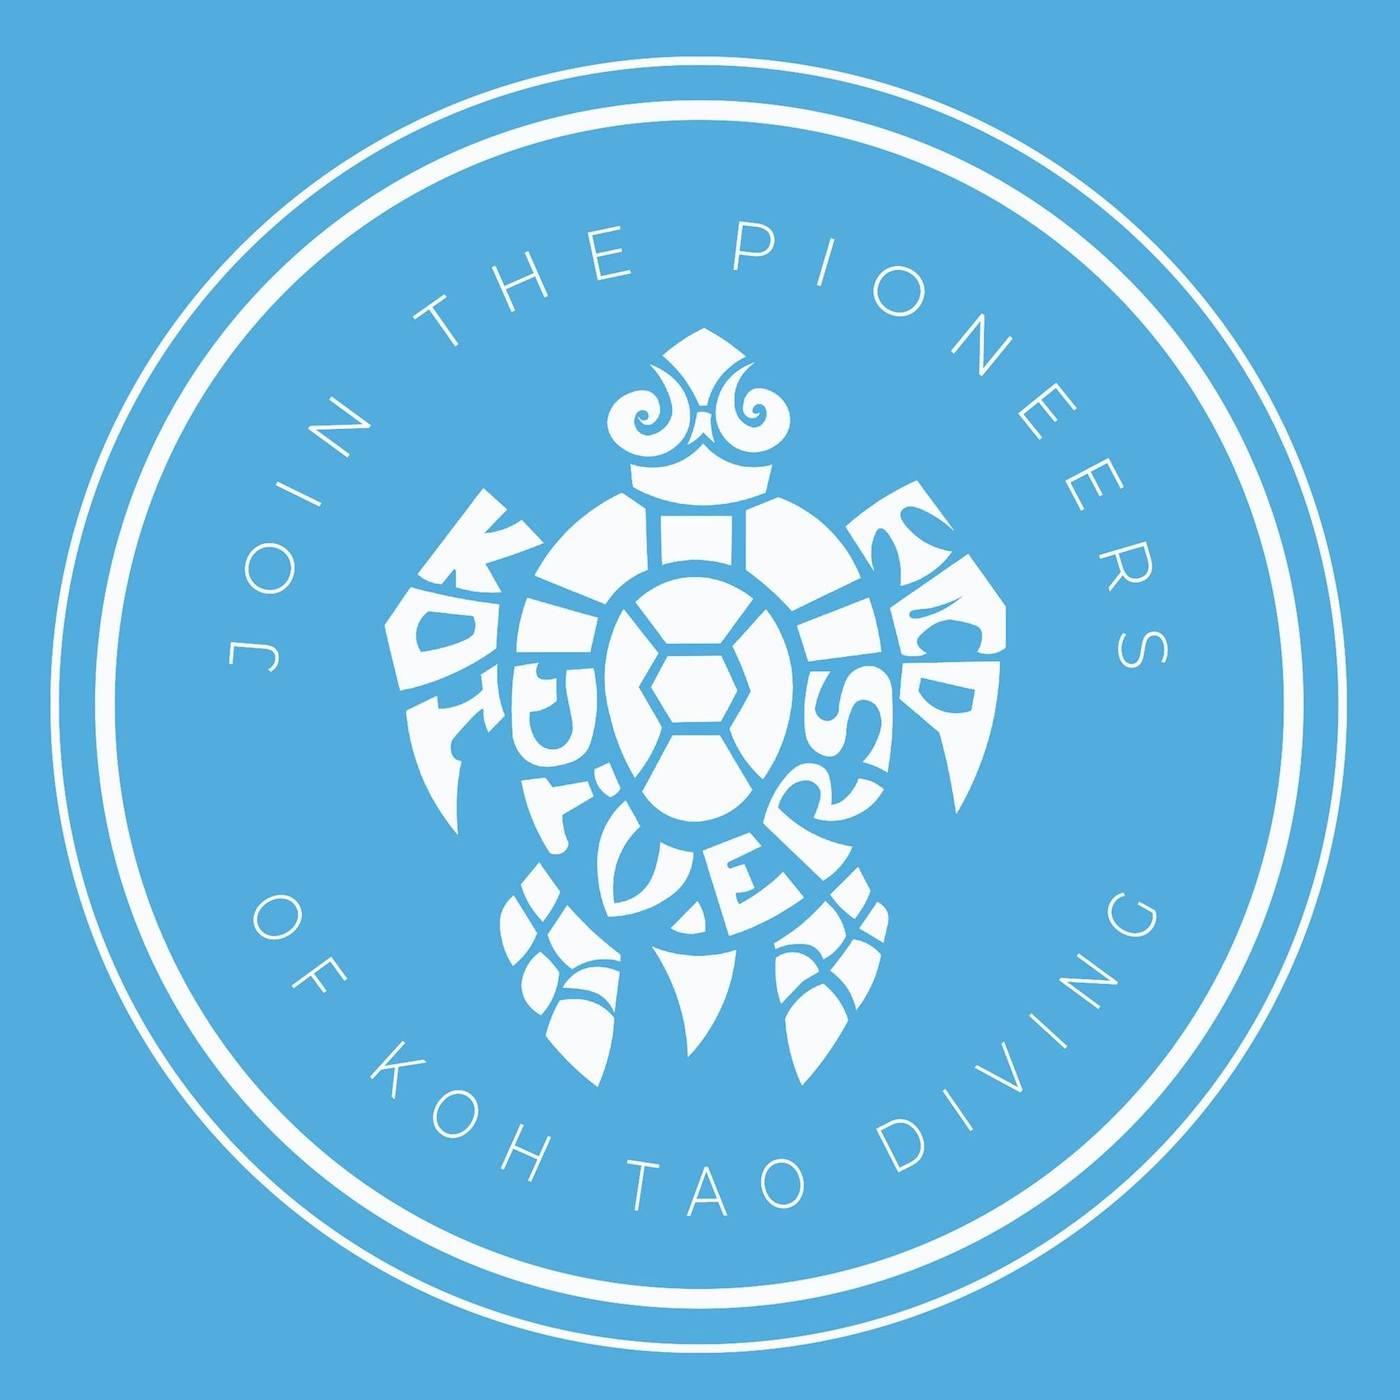 Koh Tao Divers Logo